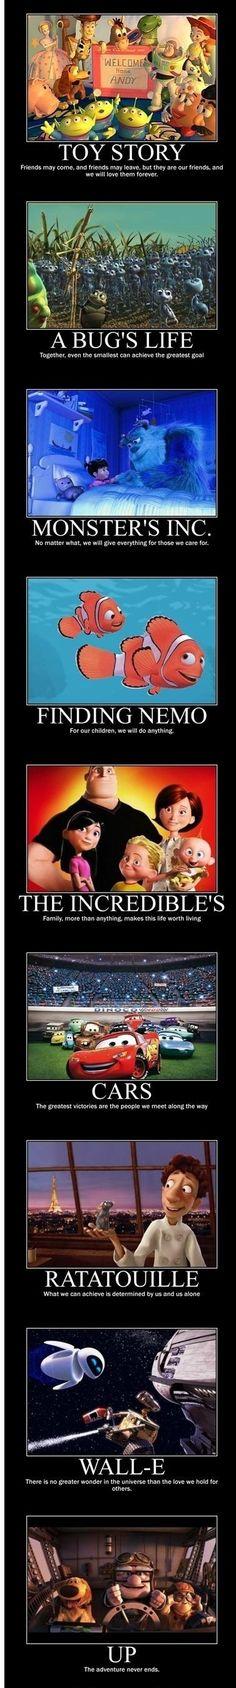 Things we learn from Pixar...